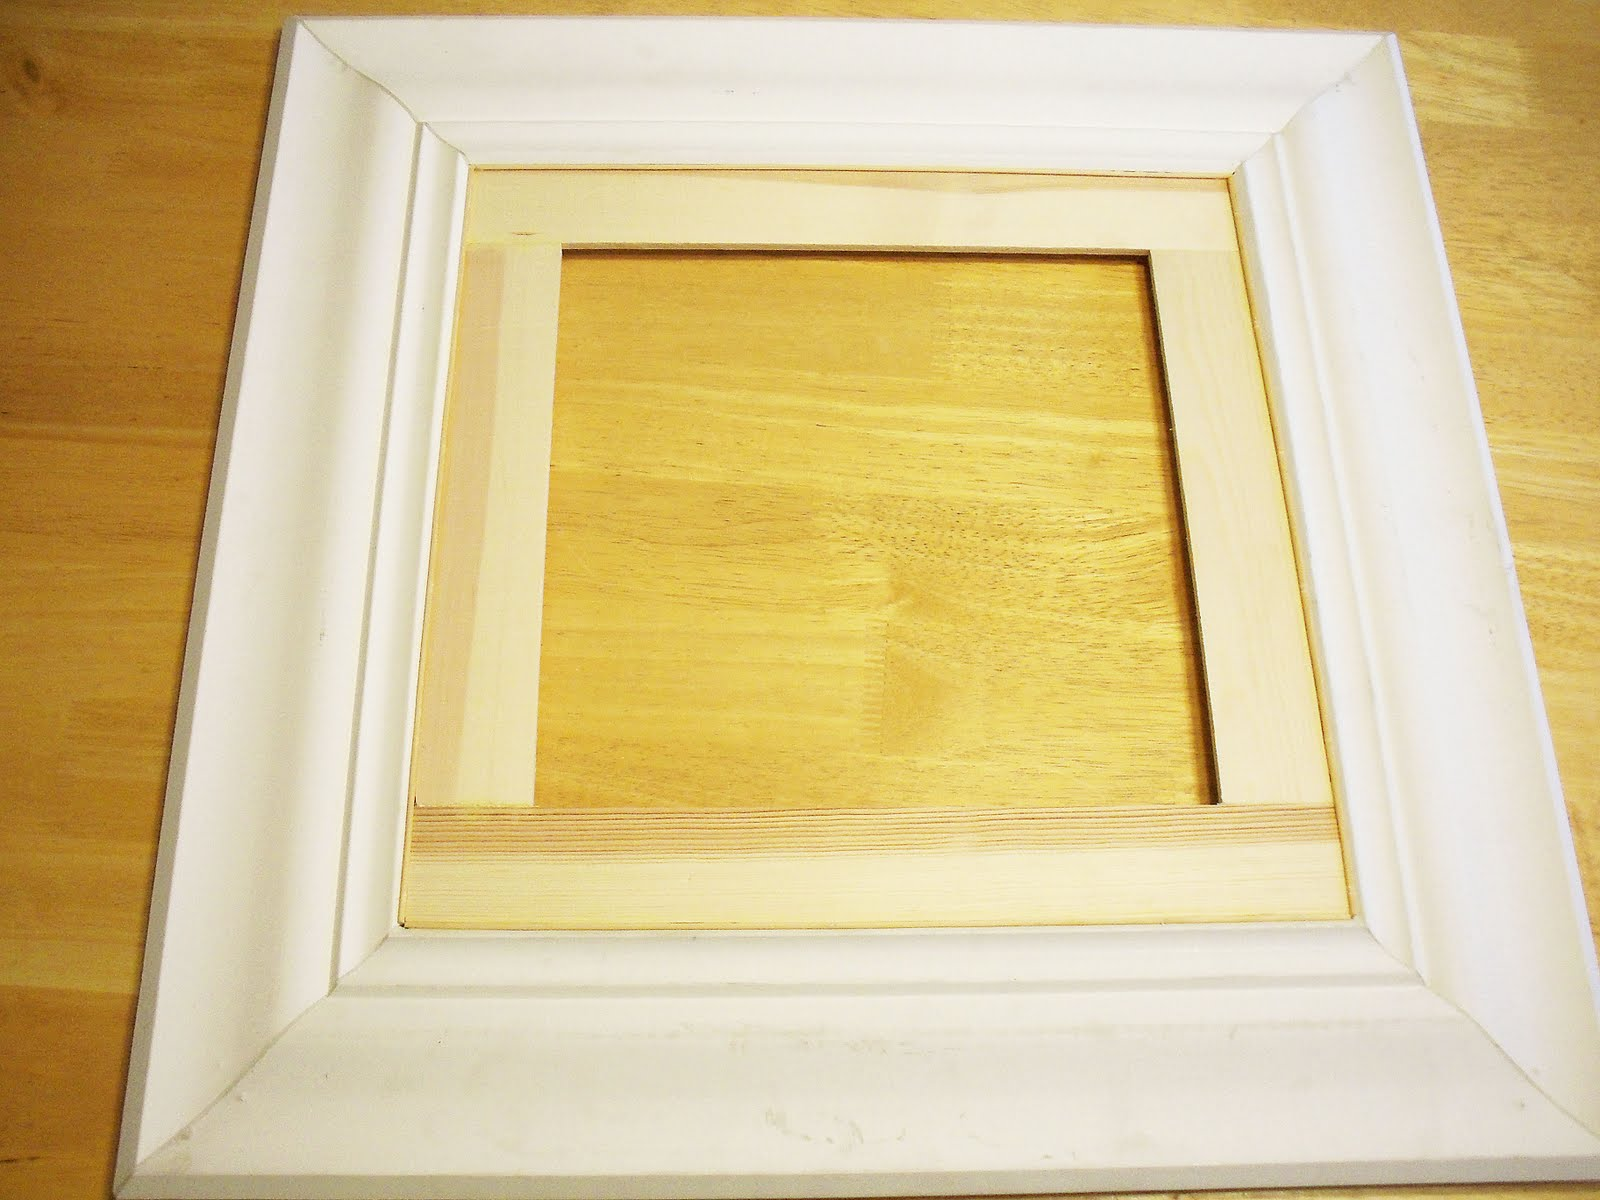 Unfinished wood mirror frames